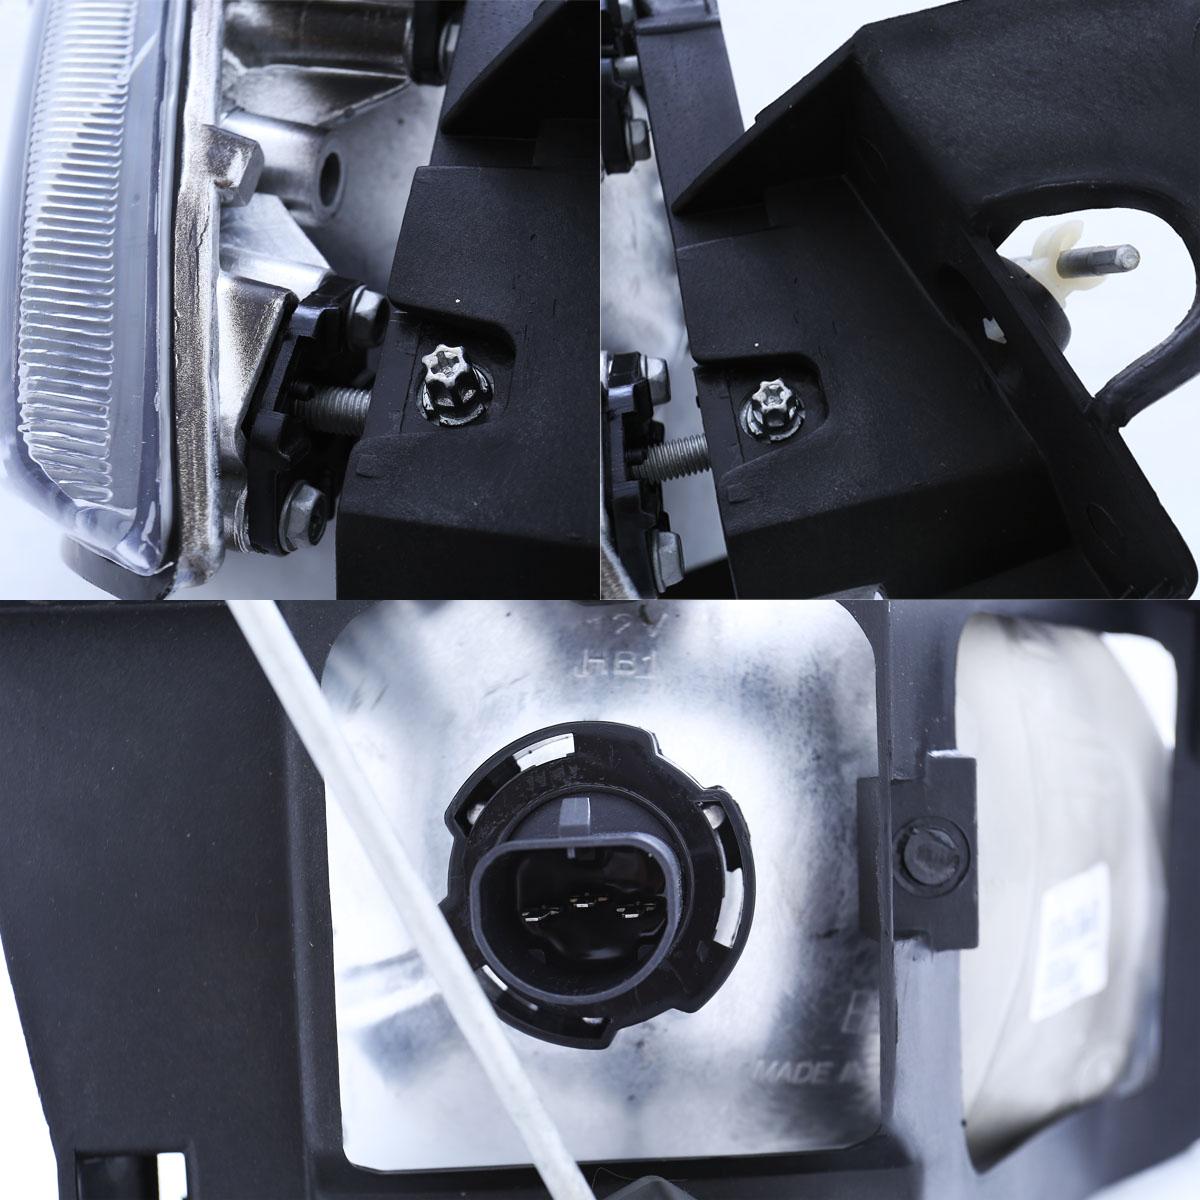 2005 Chevrolet Venture Passenger Camshaft: 1997-2005 Chevy Venture Pontiac Montana Black Headlights